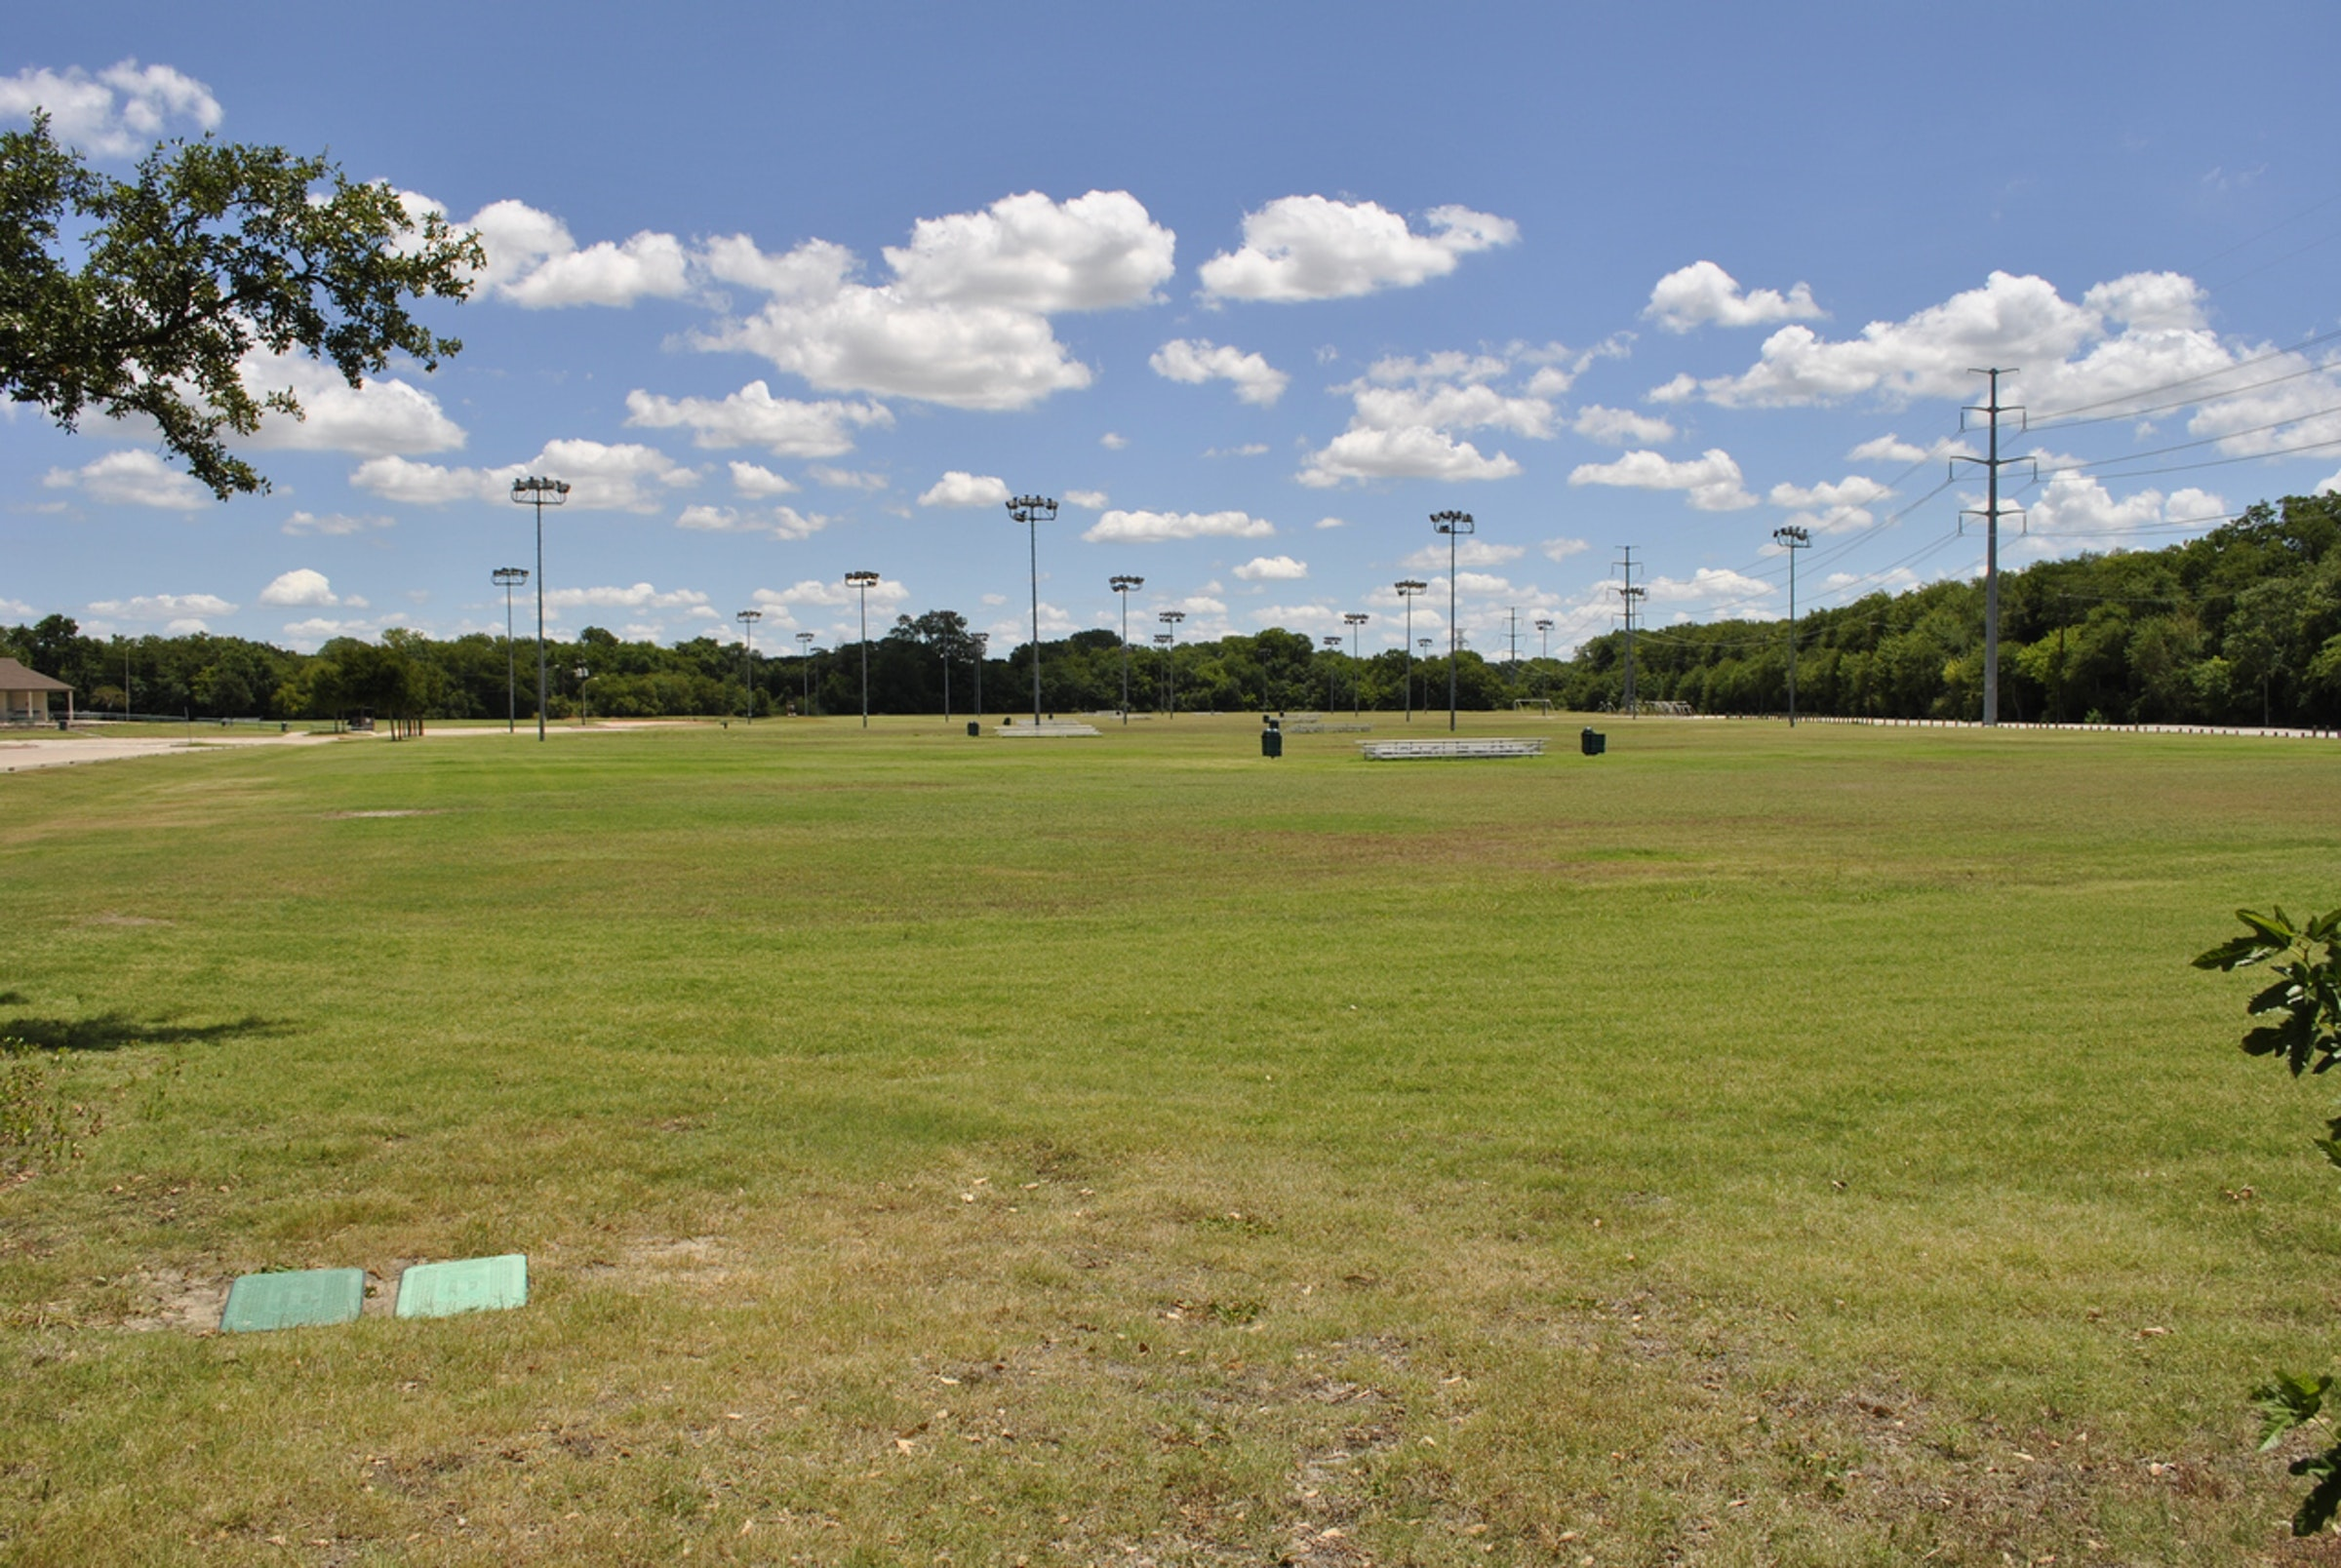 Harry S. Moss Park in Beyond Dallas